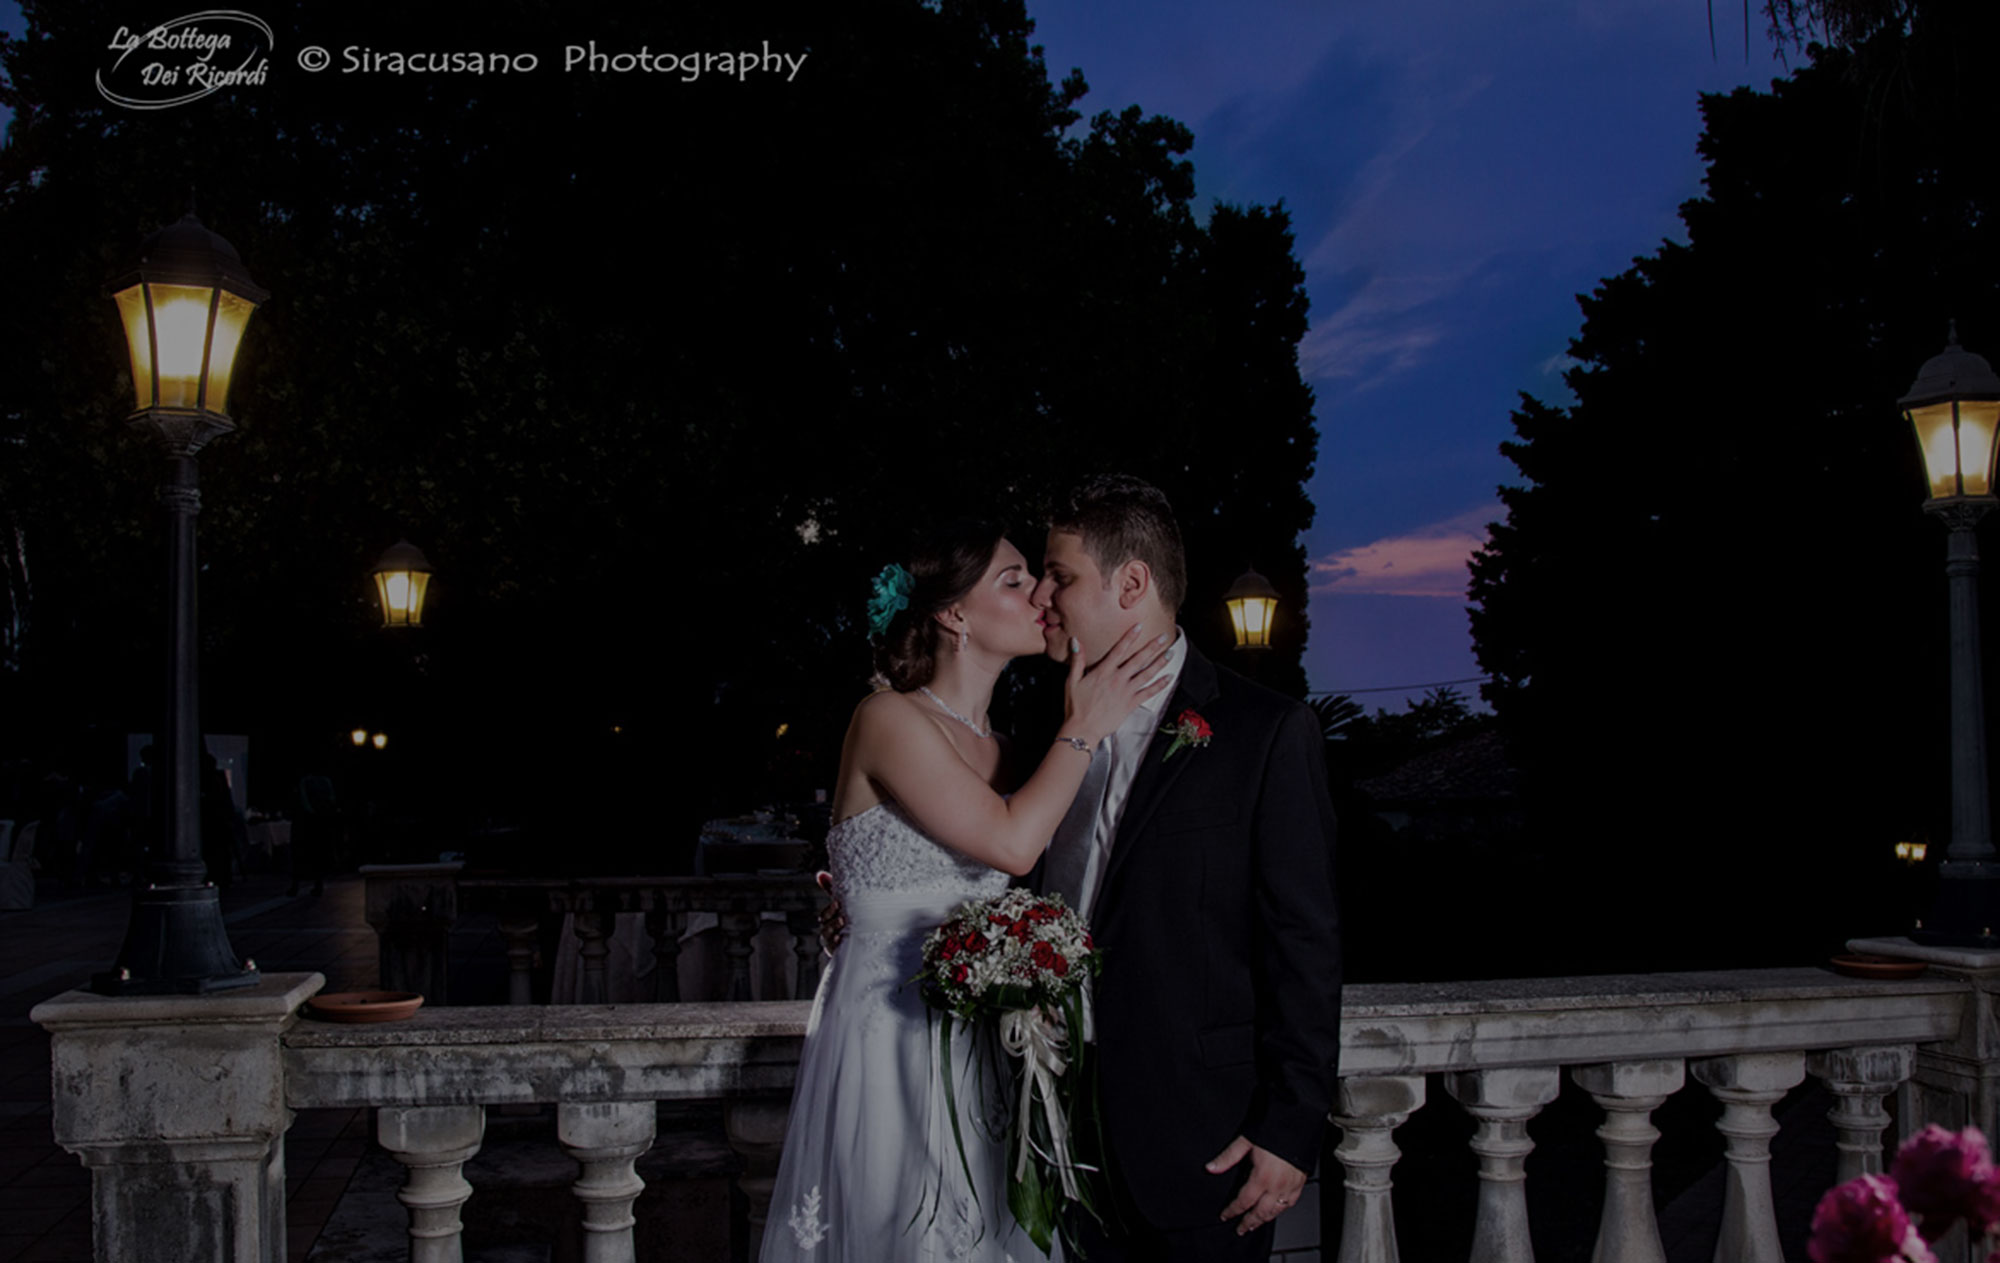 Fotografo Matrimonio La Bottega dei Ricordi Messina - Matrimonio Giulio e Jona